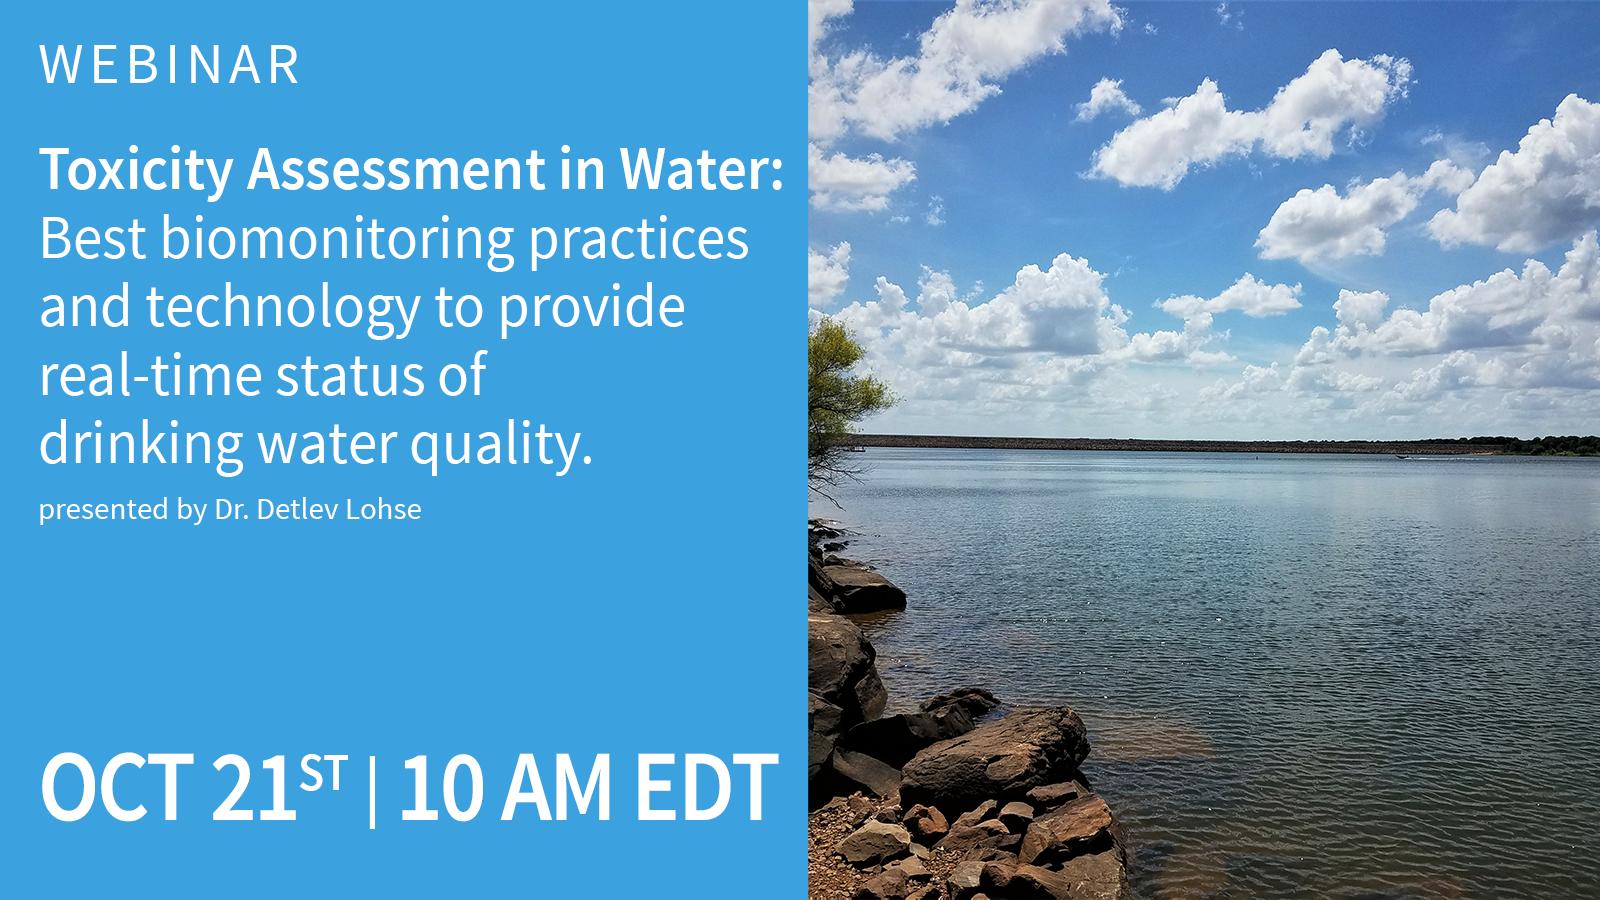 Toxic water assessment webinar